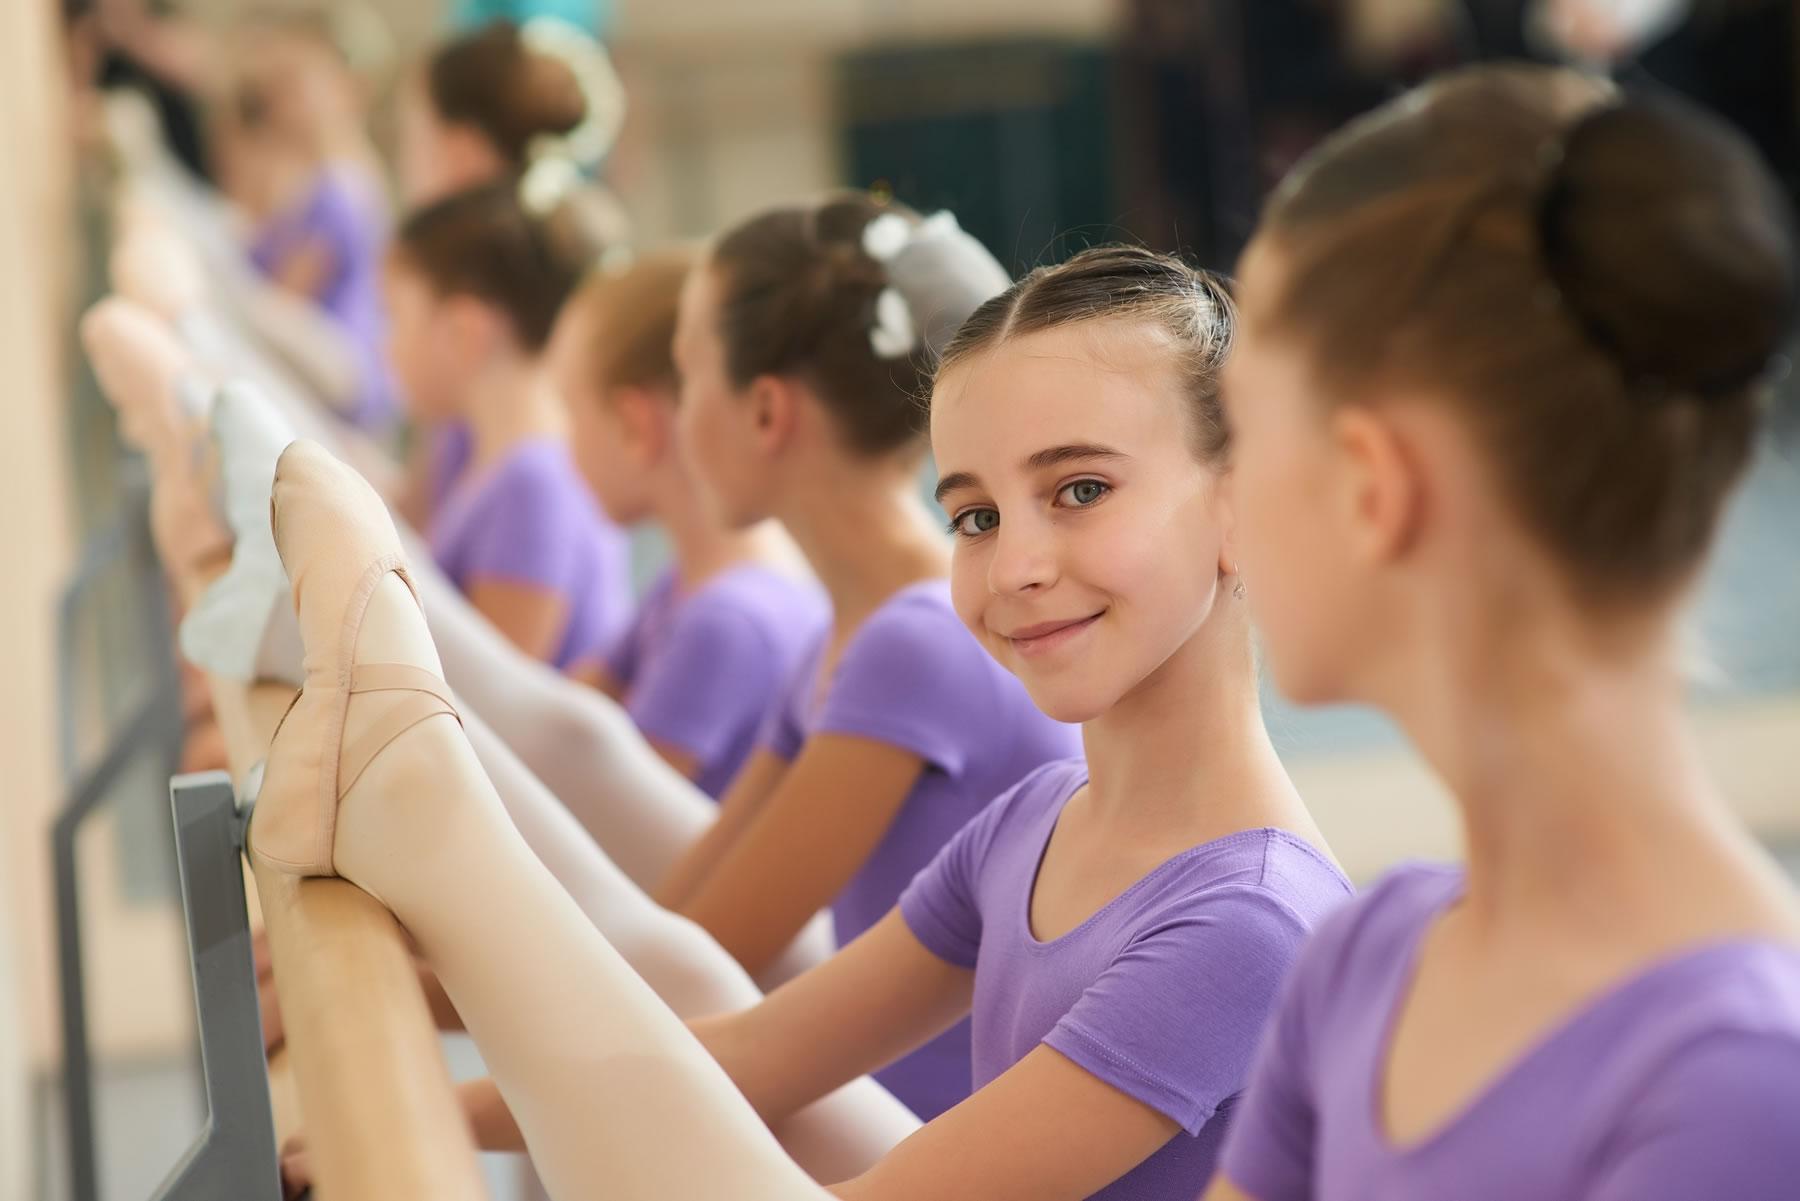 Ballet Classes - Weybridge Oatlands near Walton-on-Thames and Addlestone